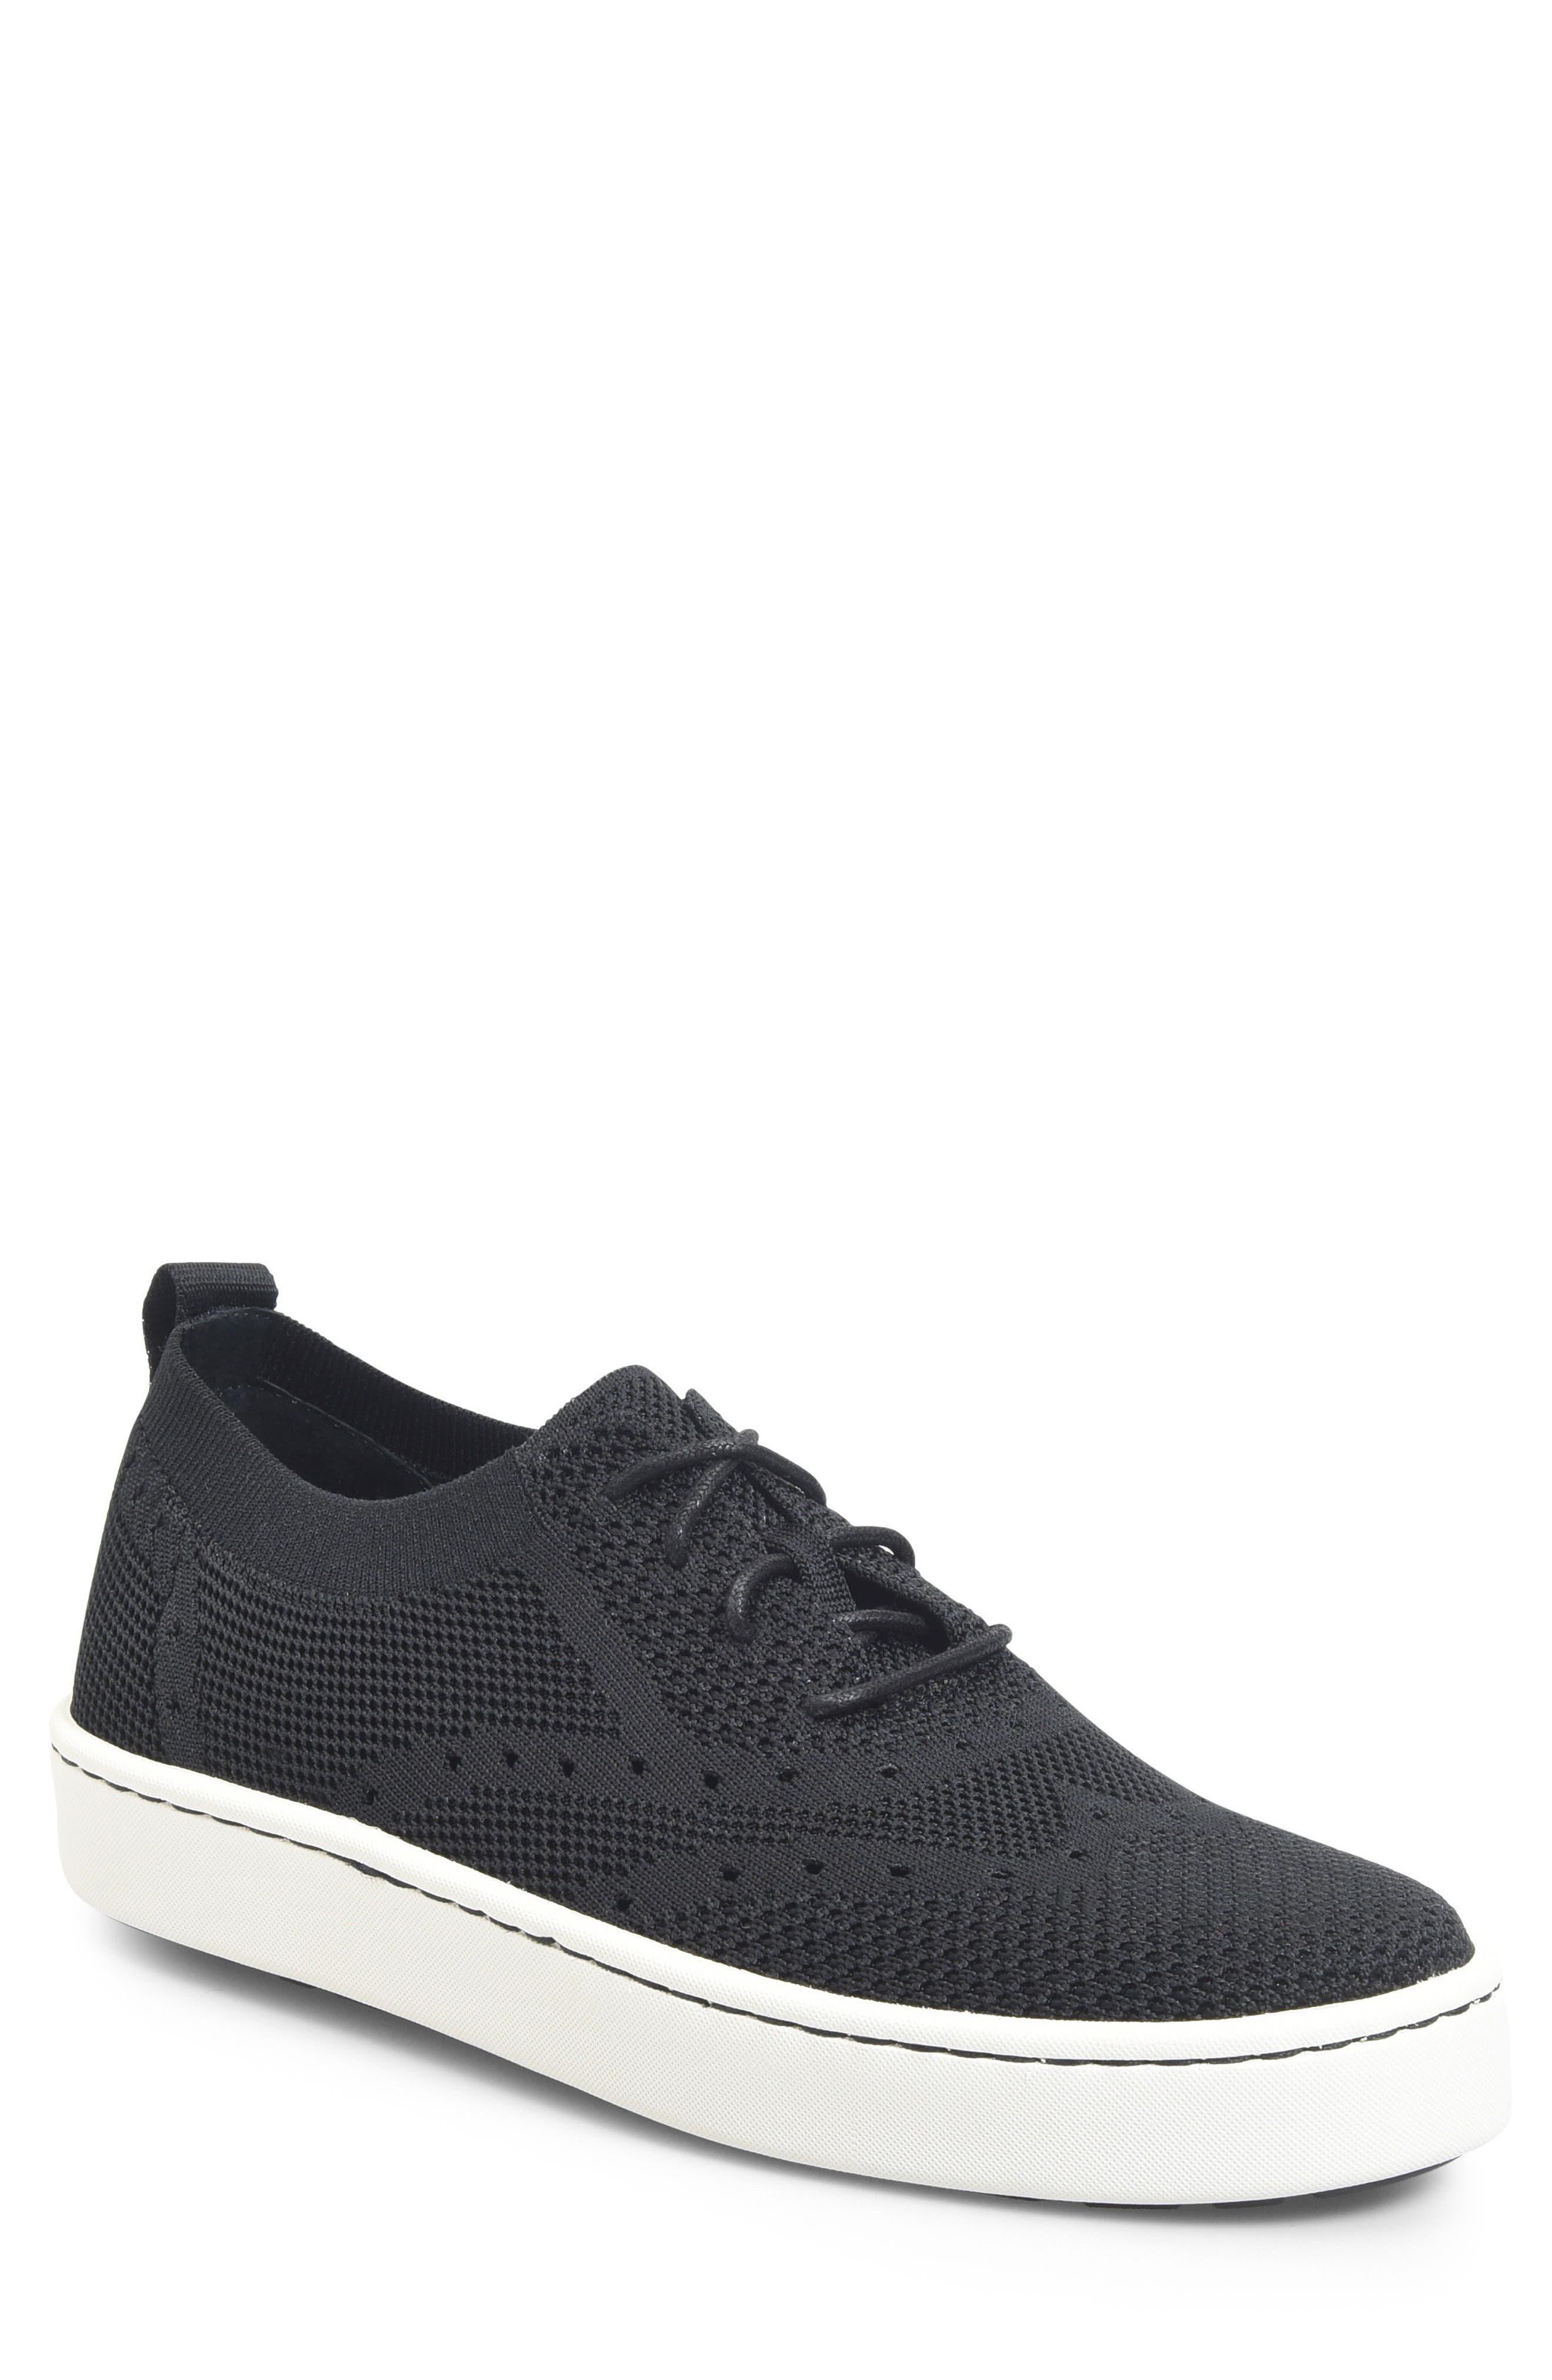 Bearse Sneaker,                             Main thumbnail 1, color,                             Black Knit